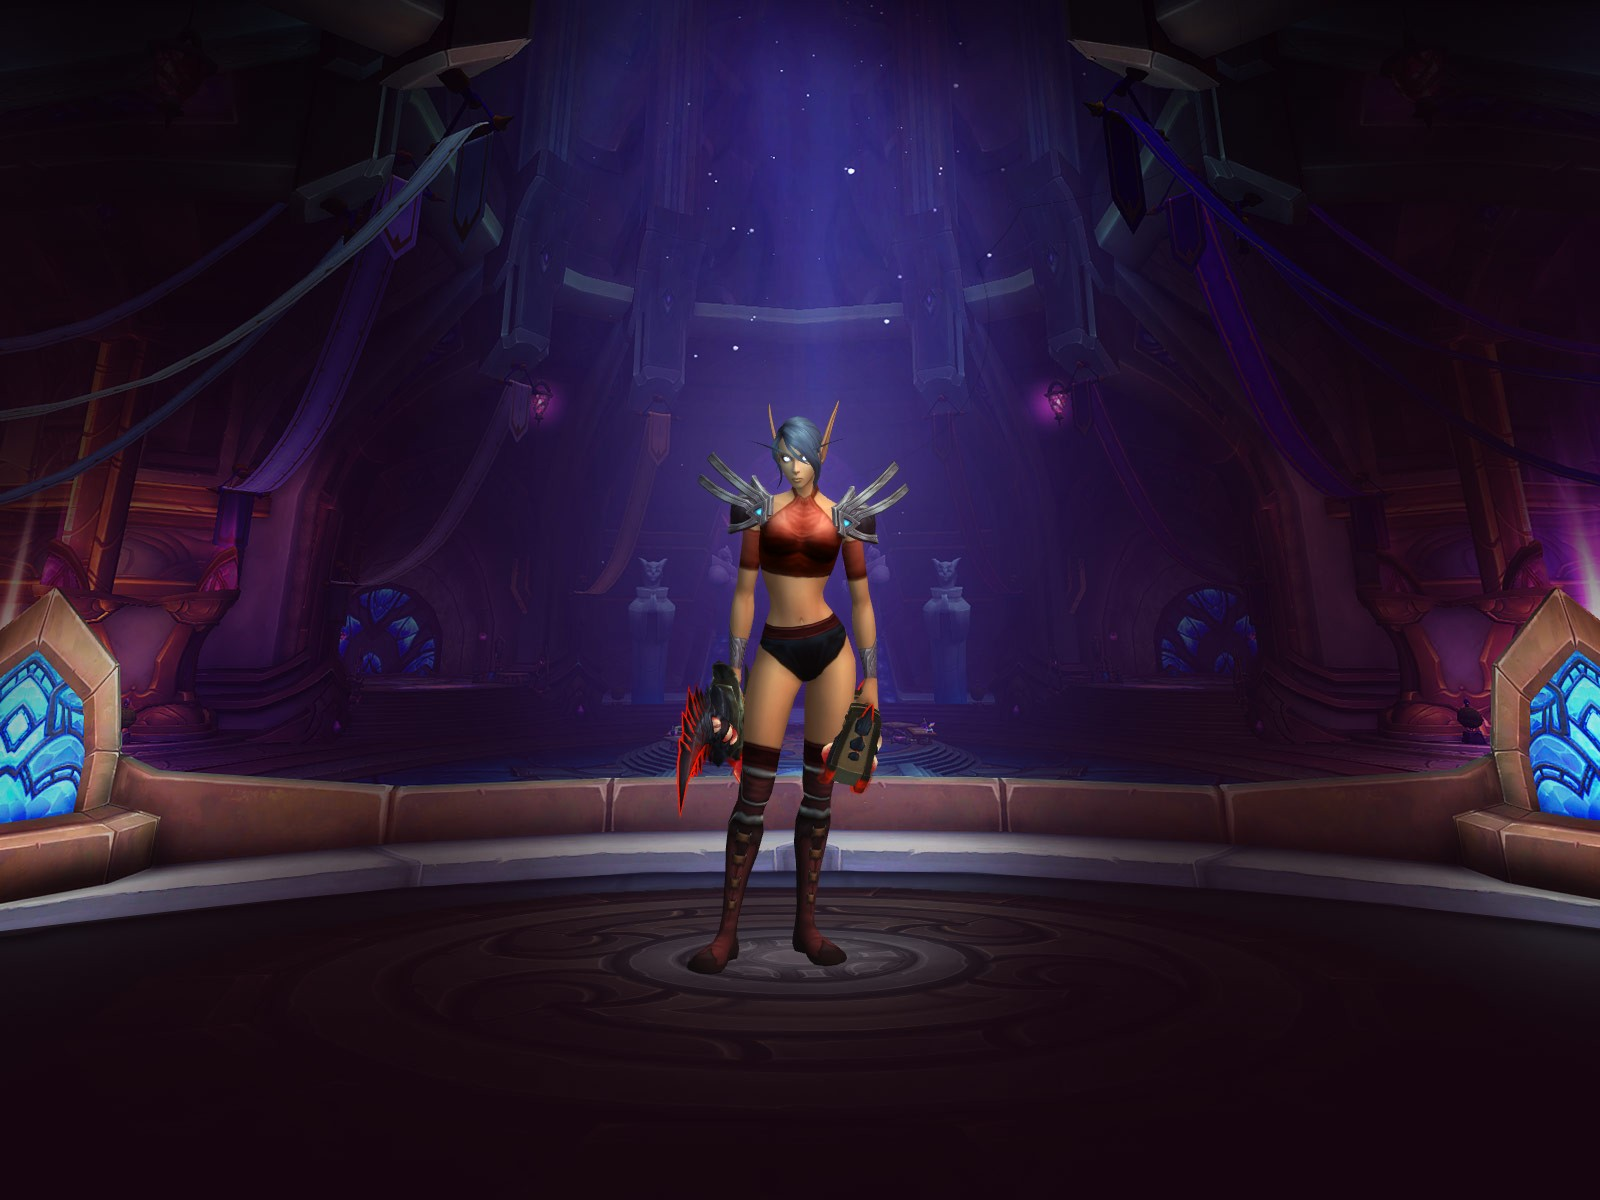 2 Hander or Sword+Board for Holy? - Paladin - World of Warcraft Forums